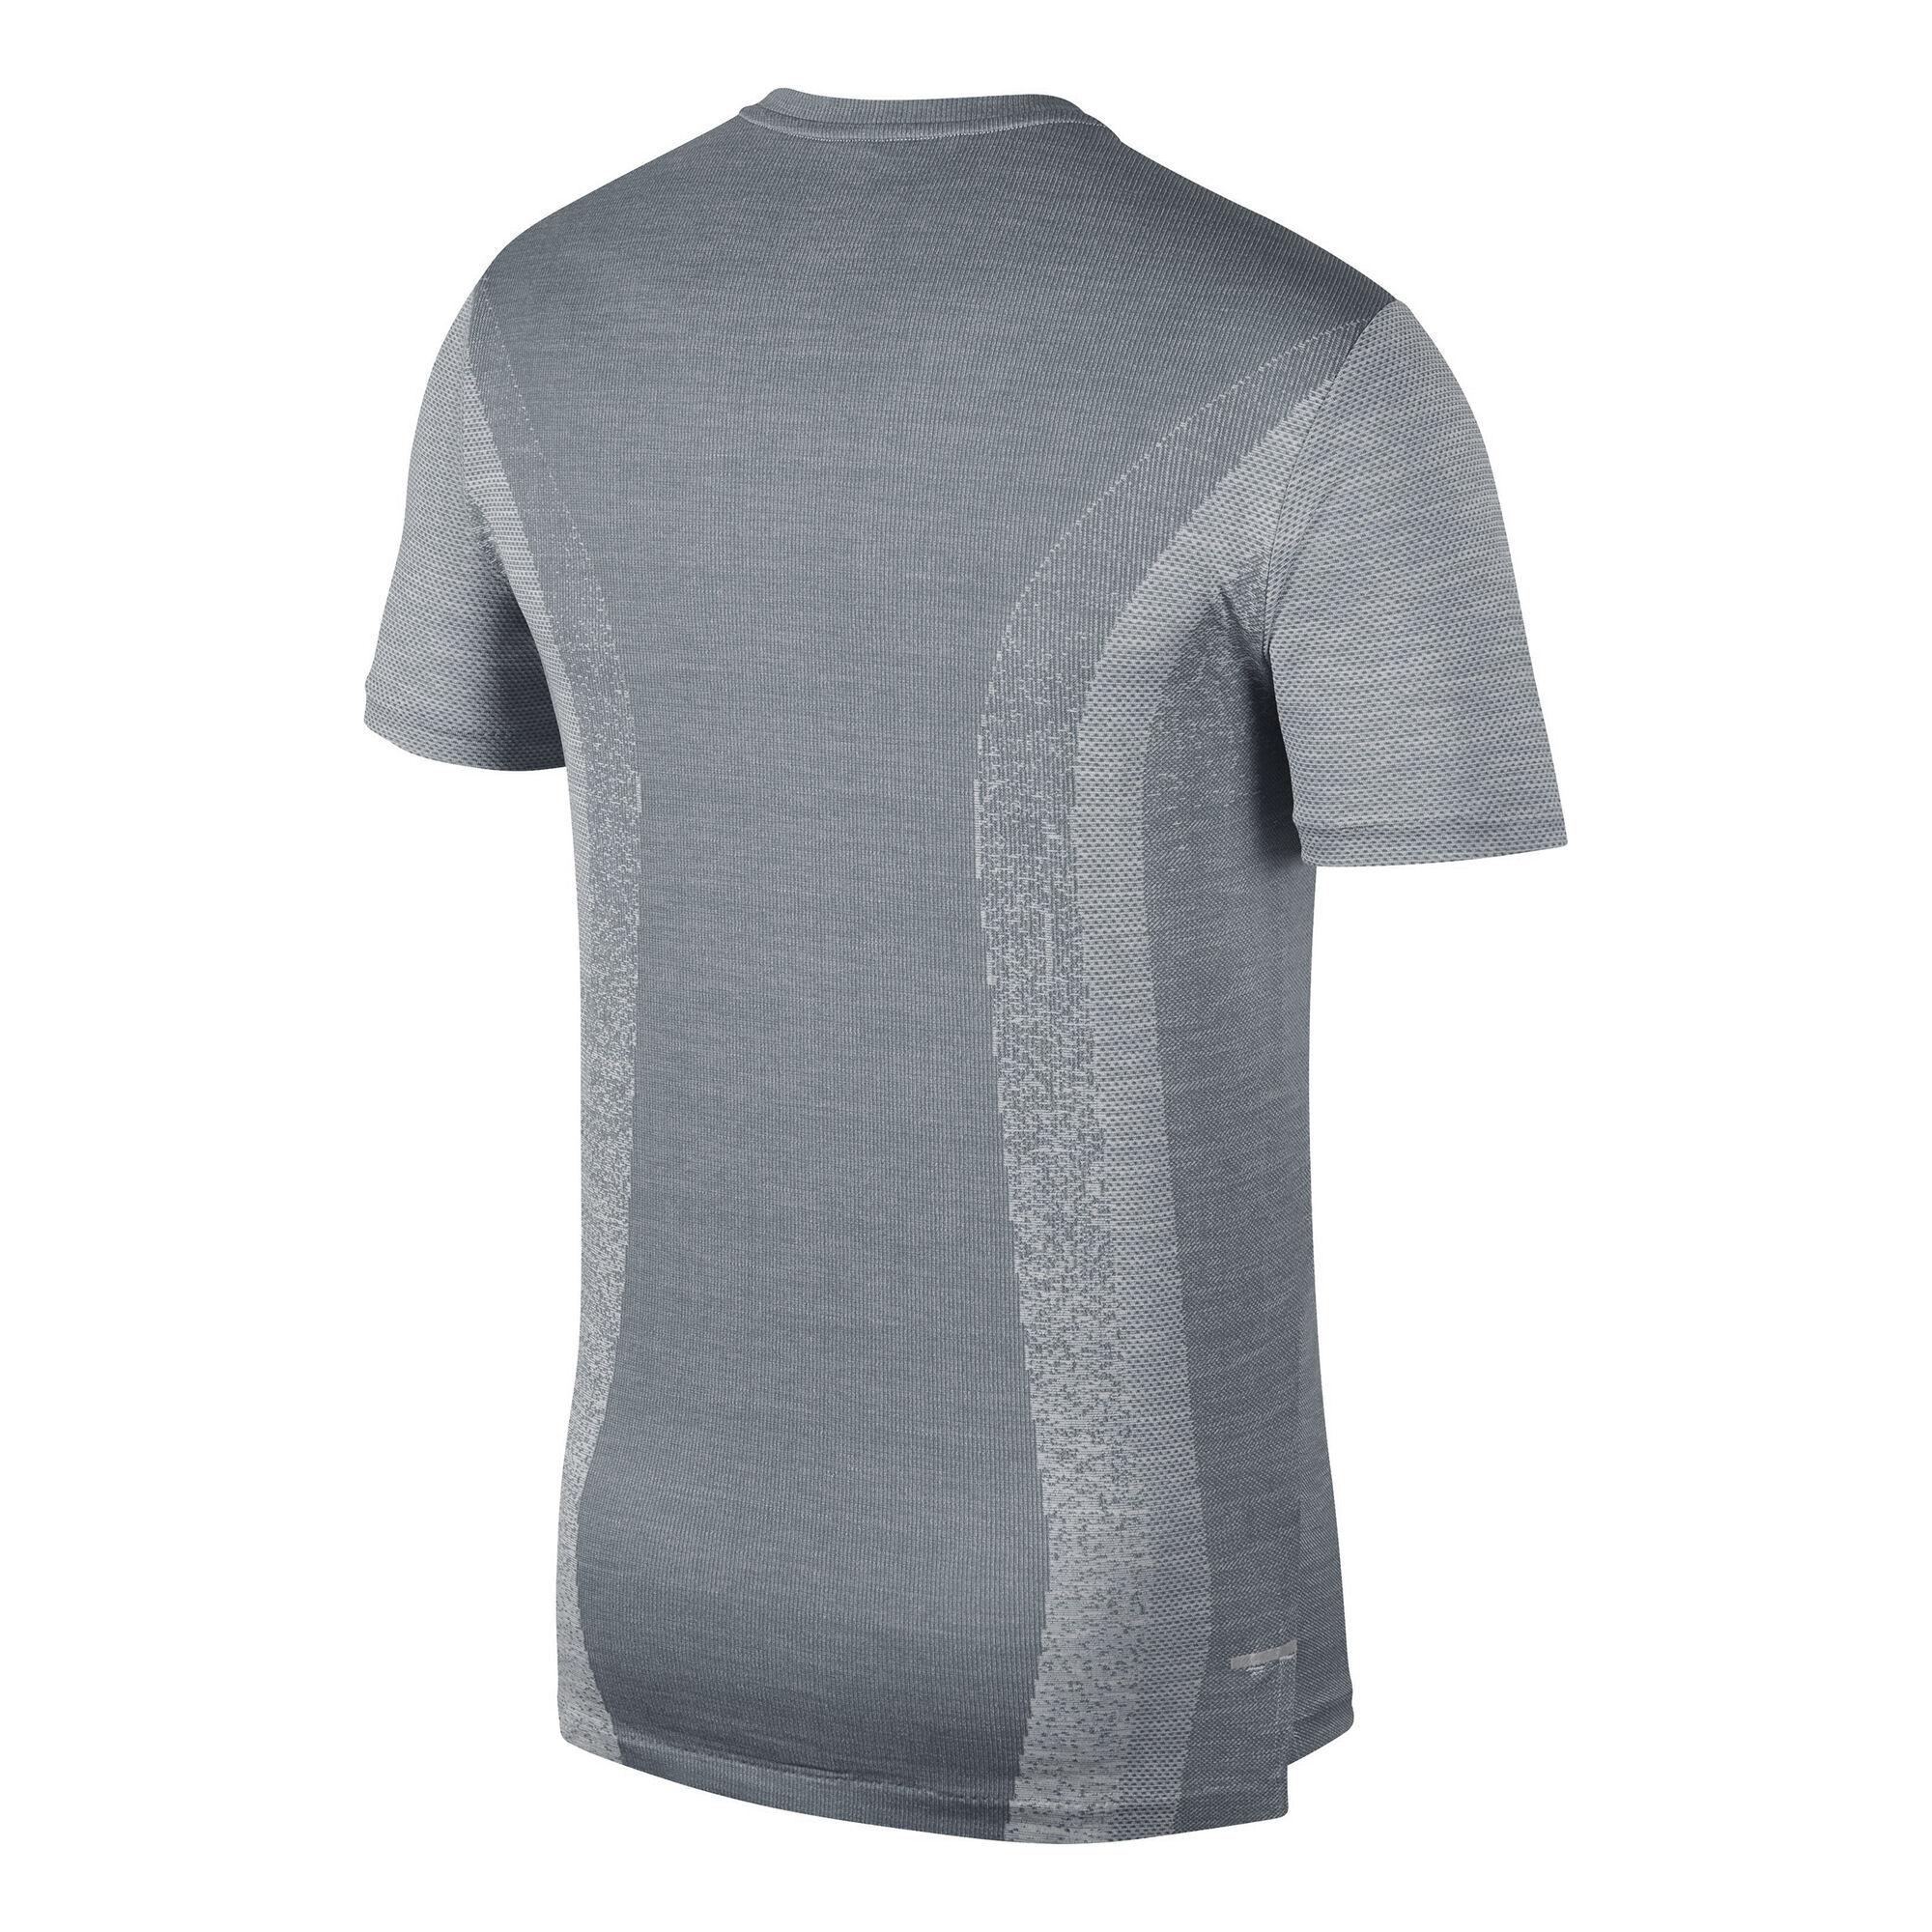 fe9e7517 buy Nike TechKnit Cool Ultra T-Shirt Men - Dark Grey, Silver online ...